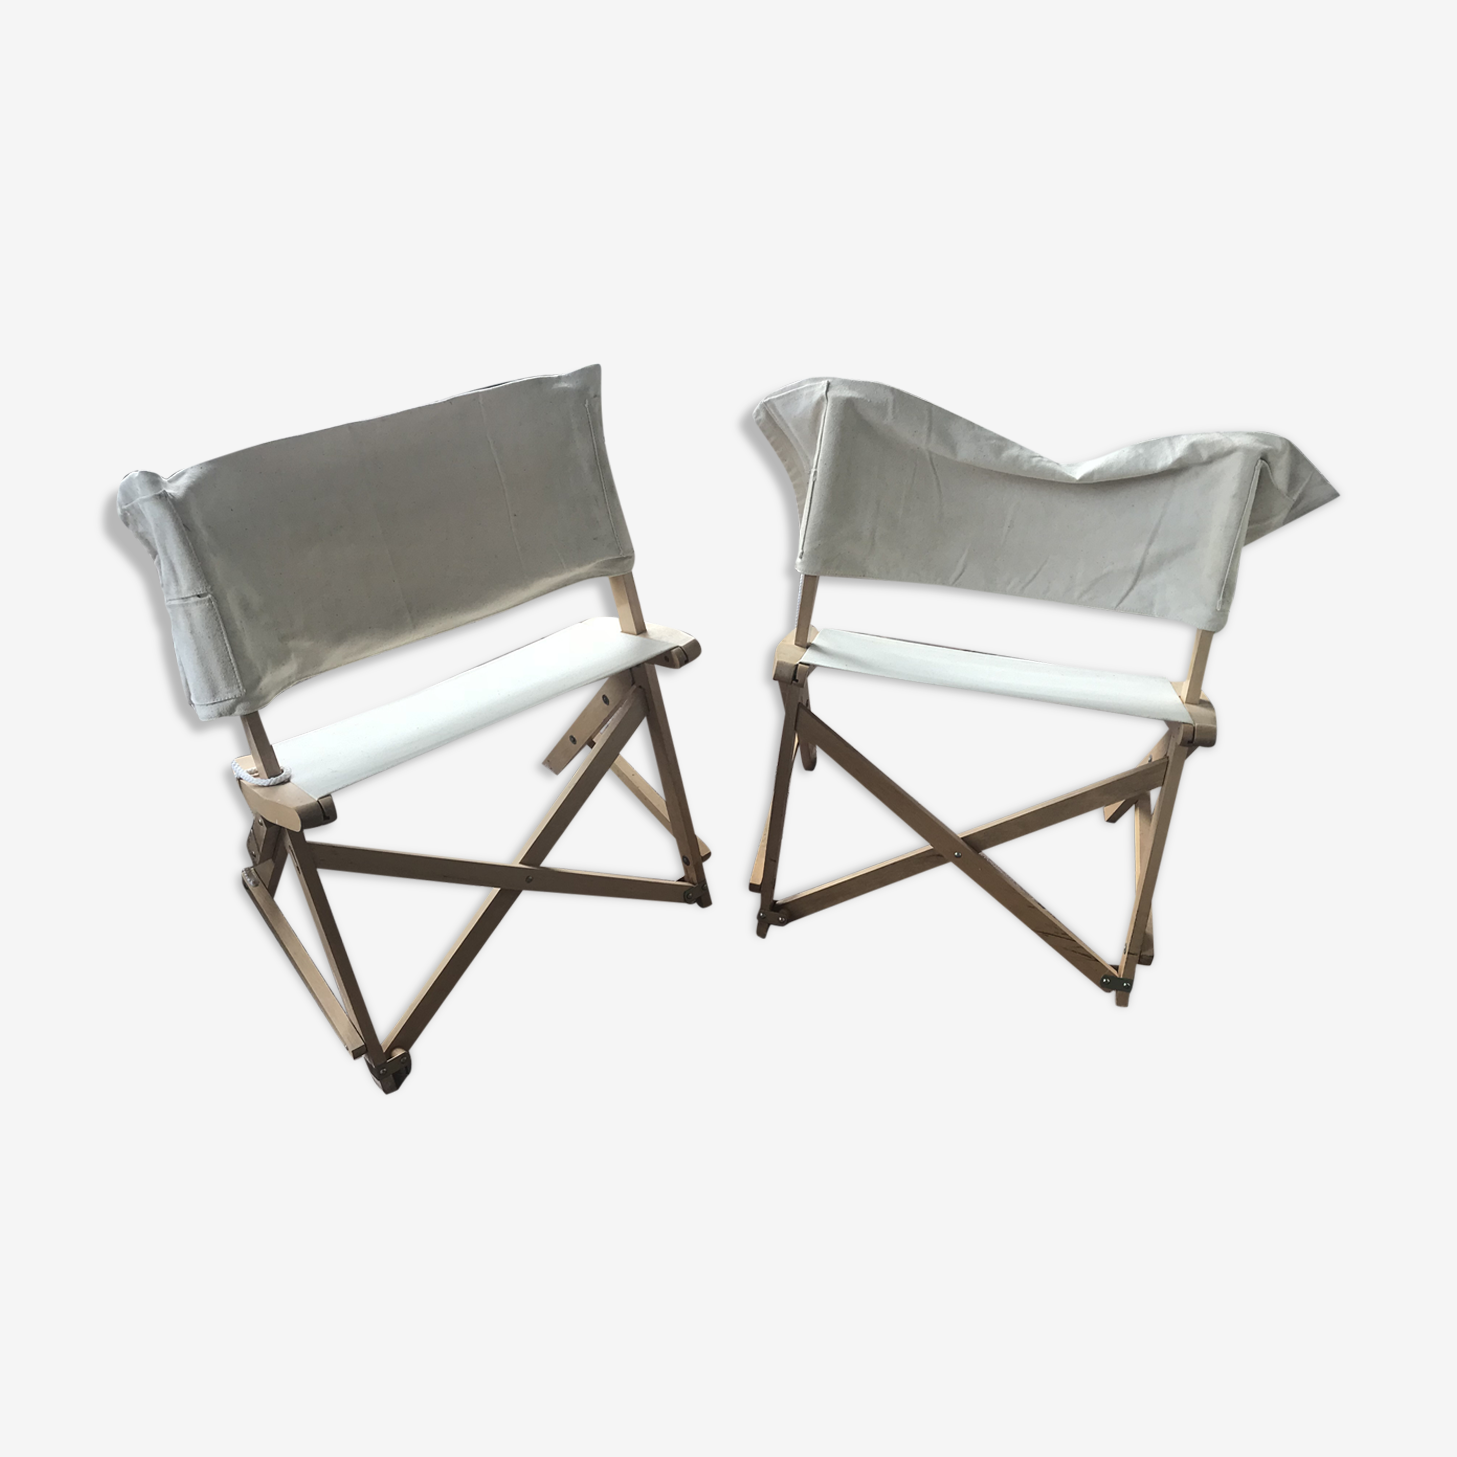 Pair of vintage camping chair